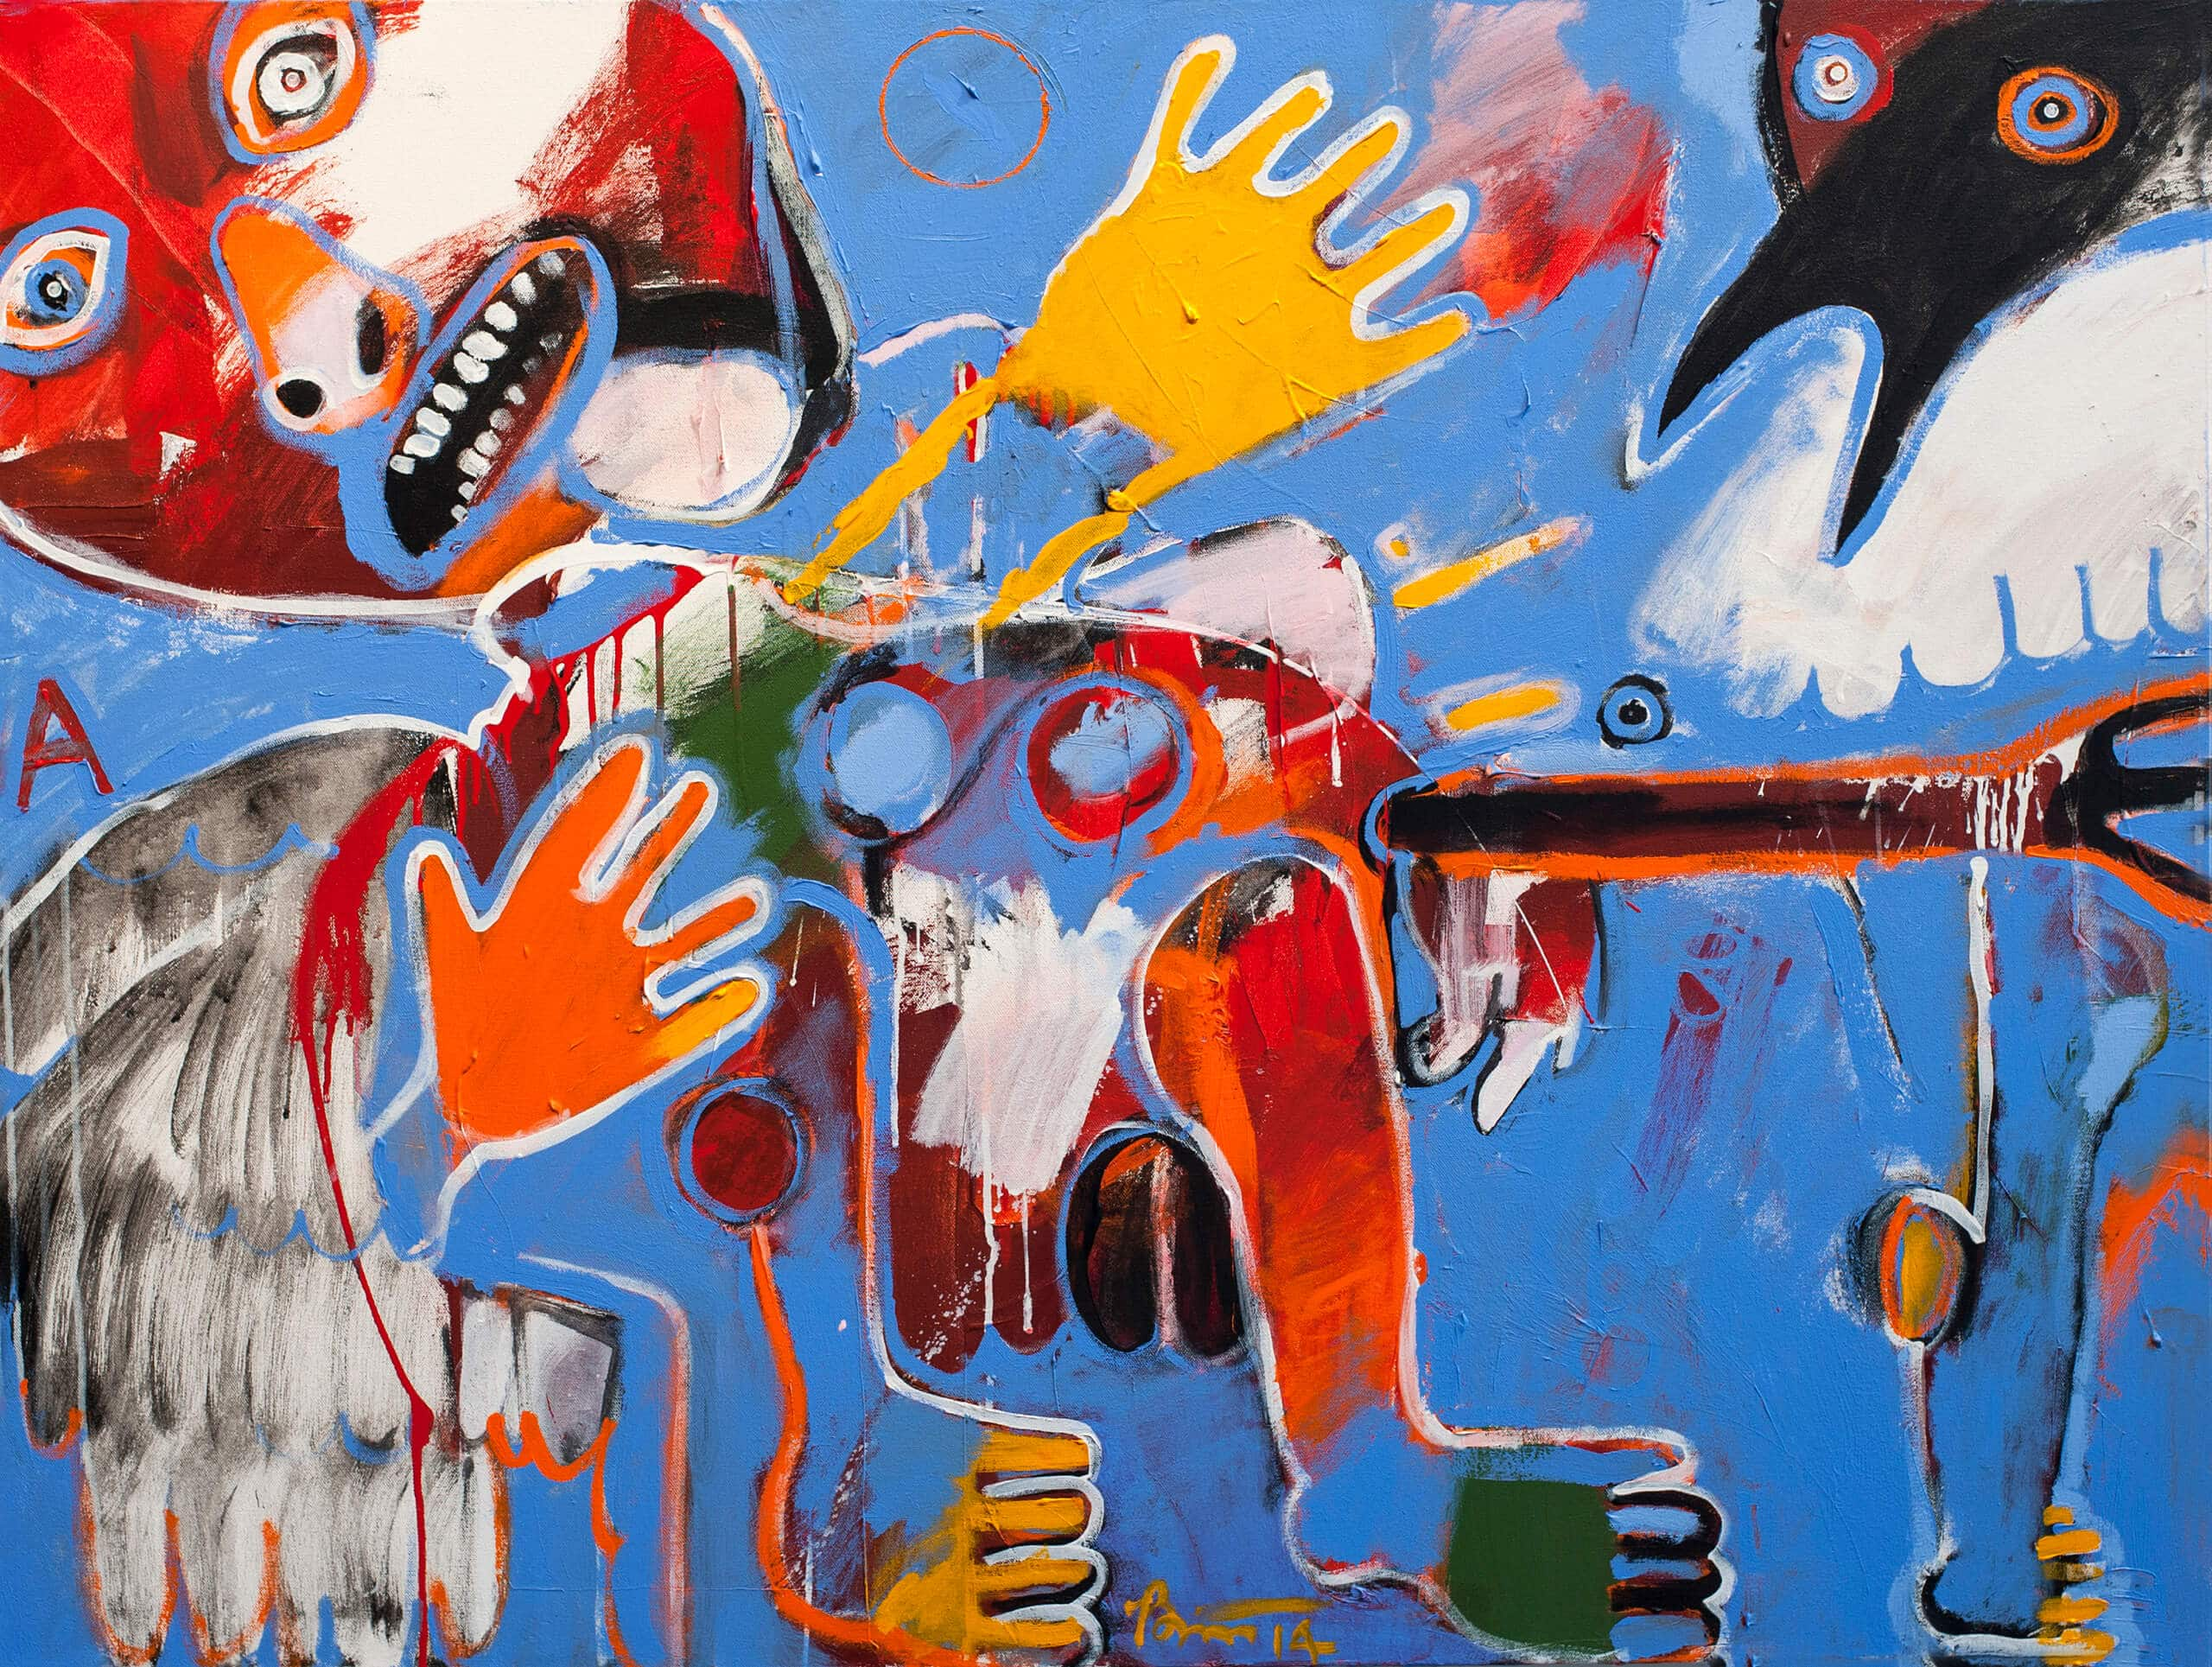 Contemporary Native American Artist Rick Bartow Passes Away Institute Of American Indian Arts Iaia